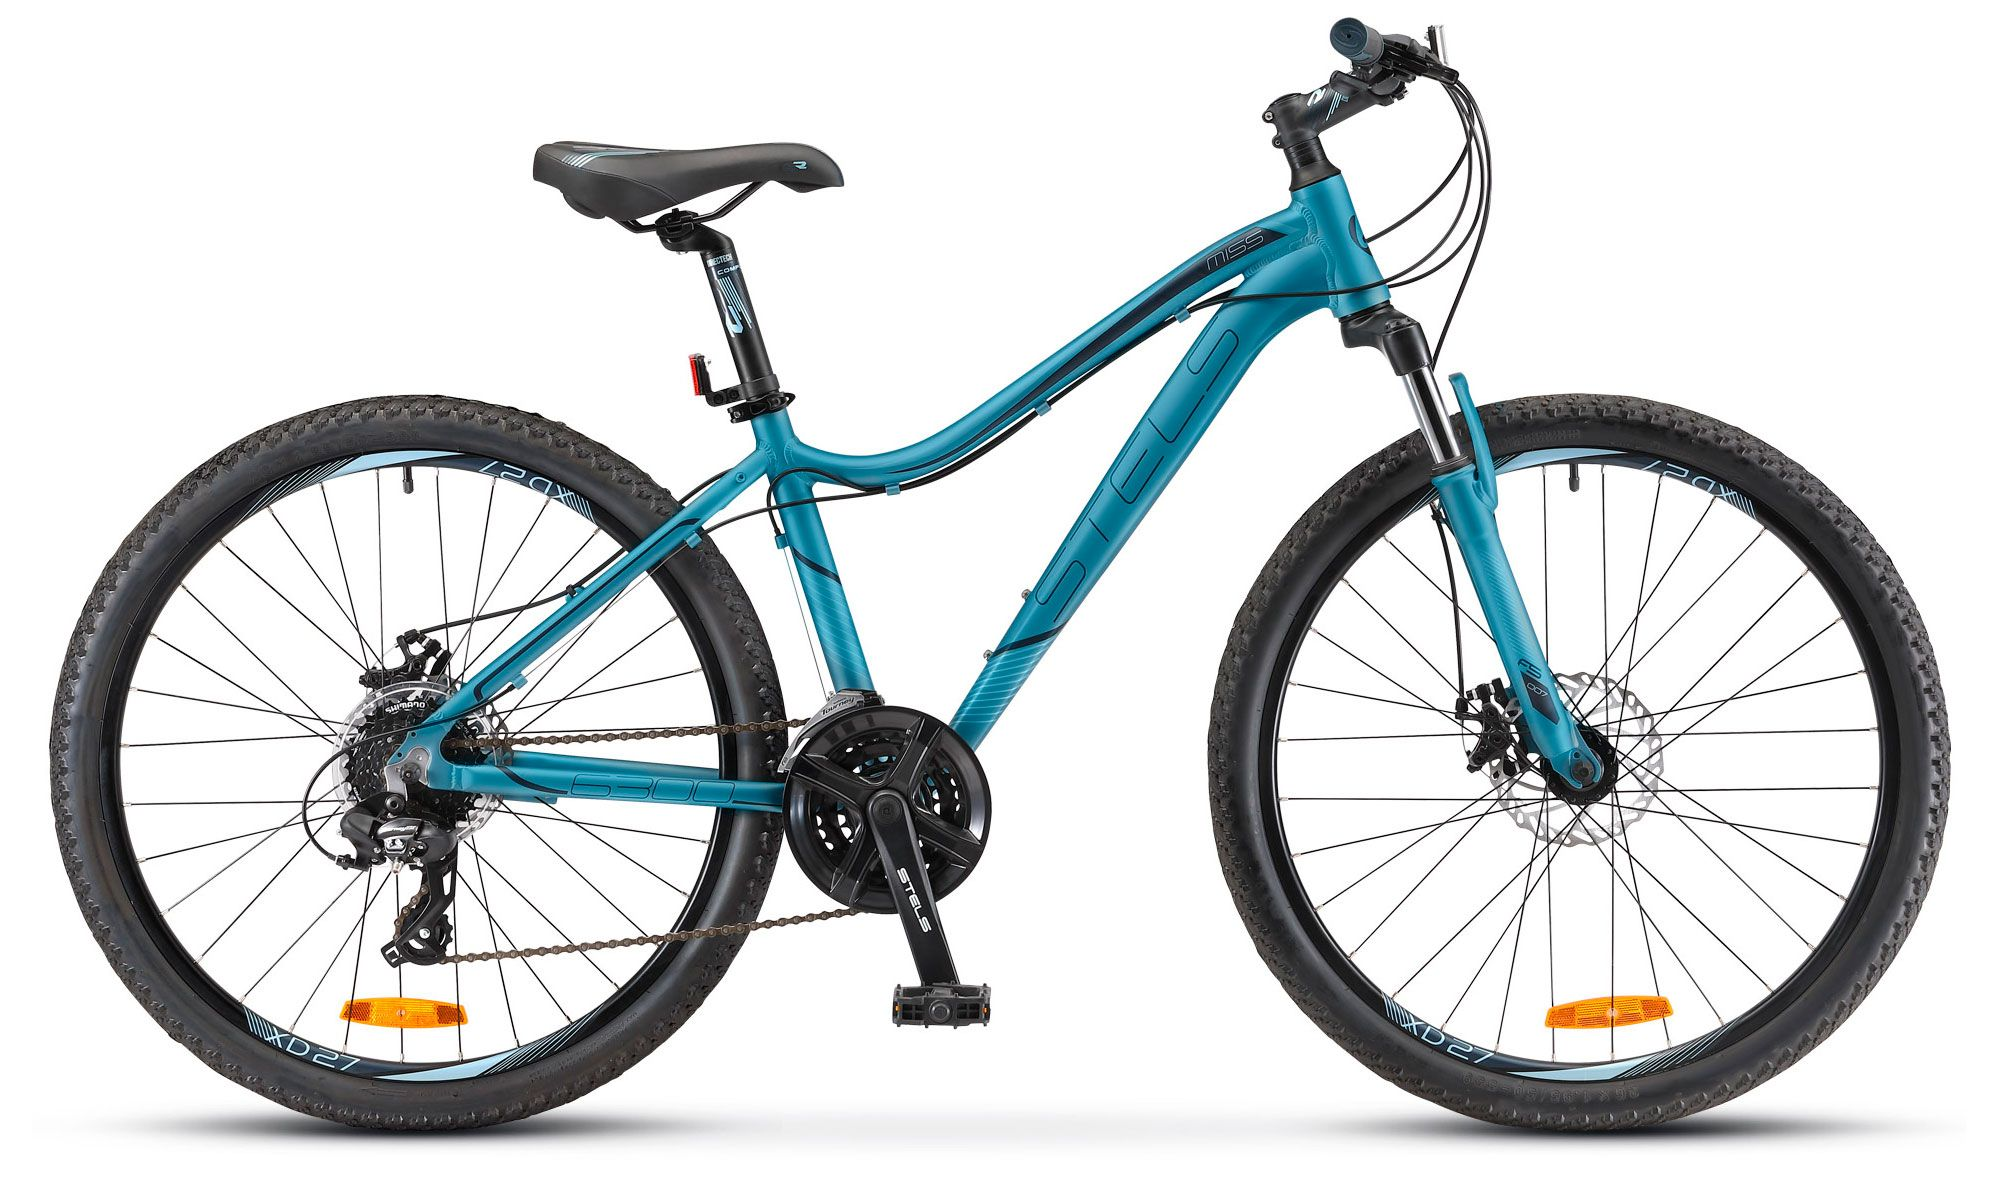 Велосипед Stels Miss 6300 MD 26 (V020) 2018 велосипед stels miss 7300 md 2015